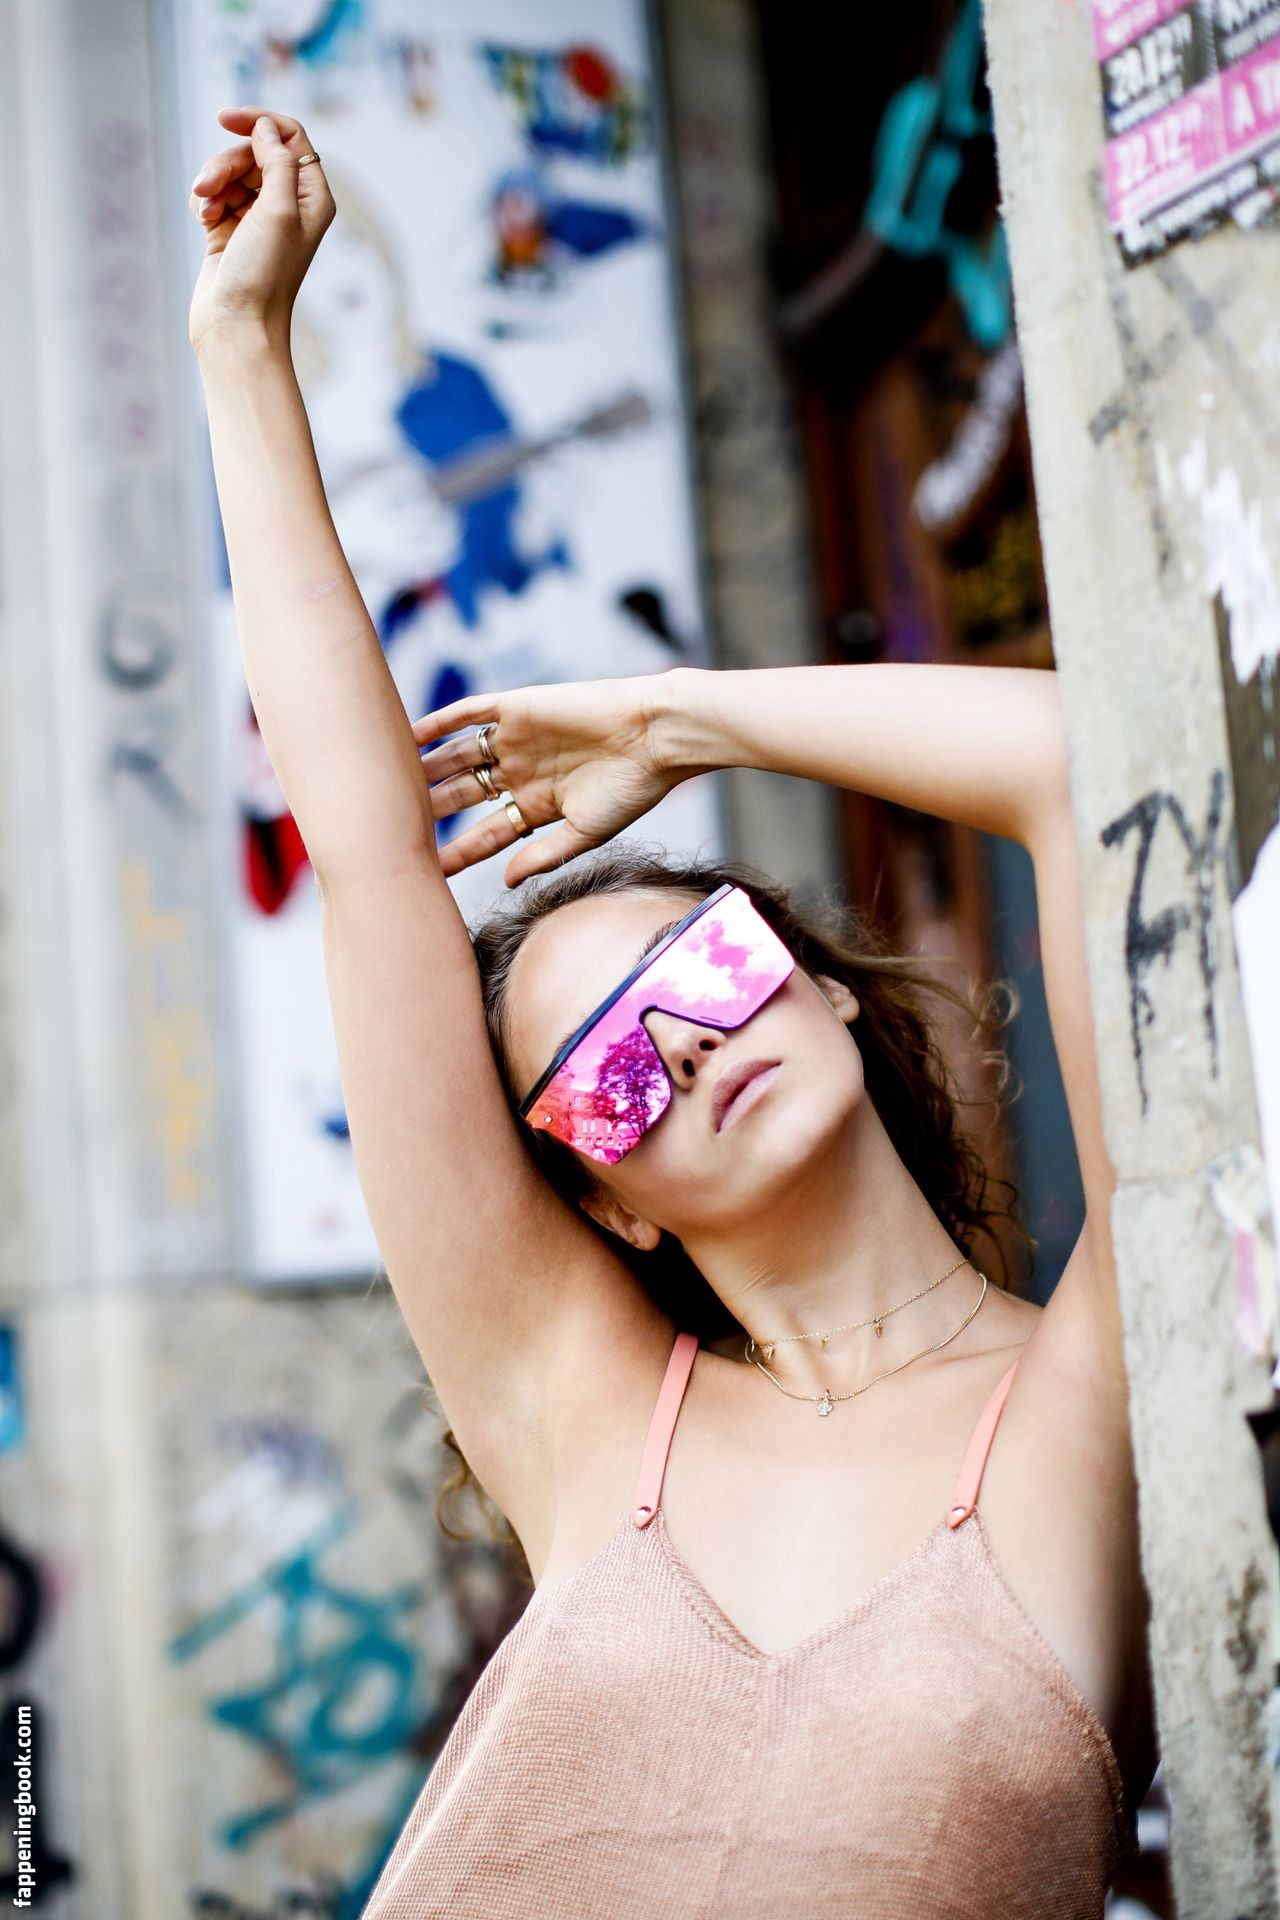 Carriere nude elena Elena Carriere